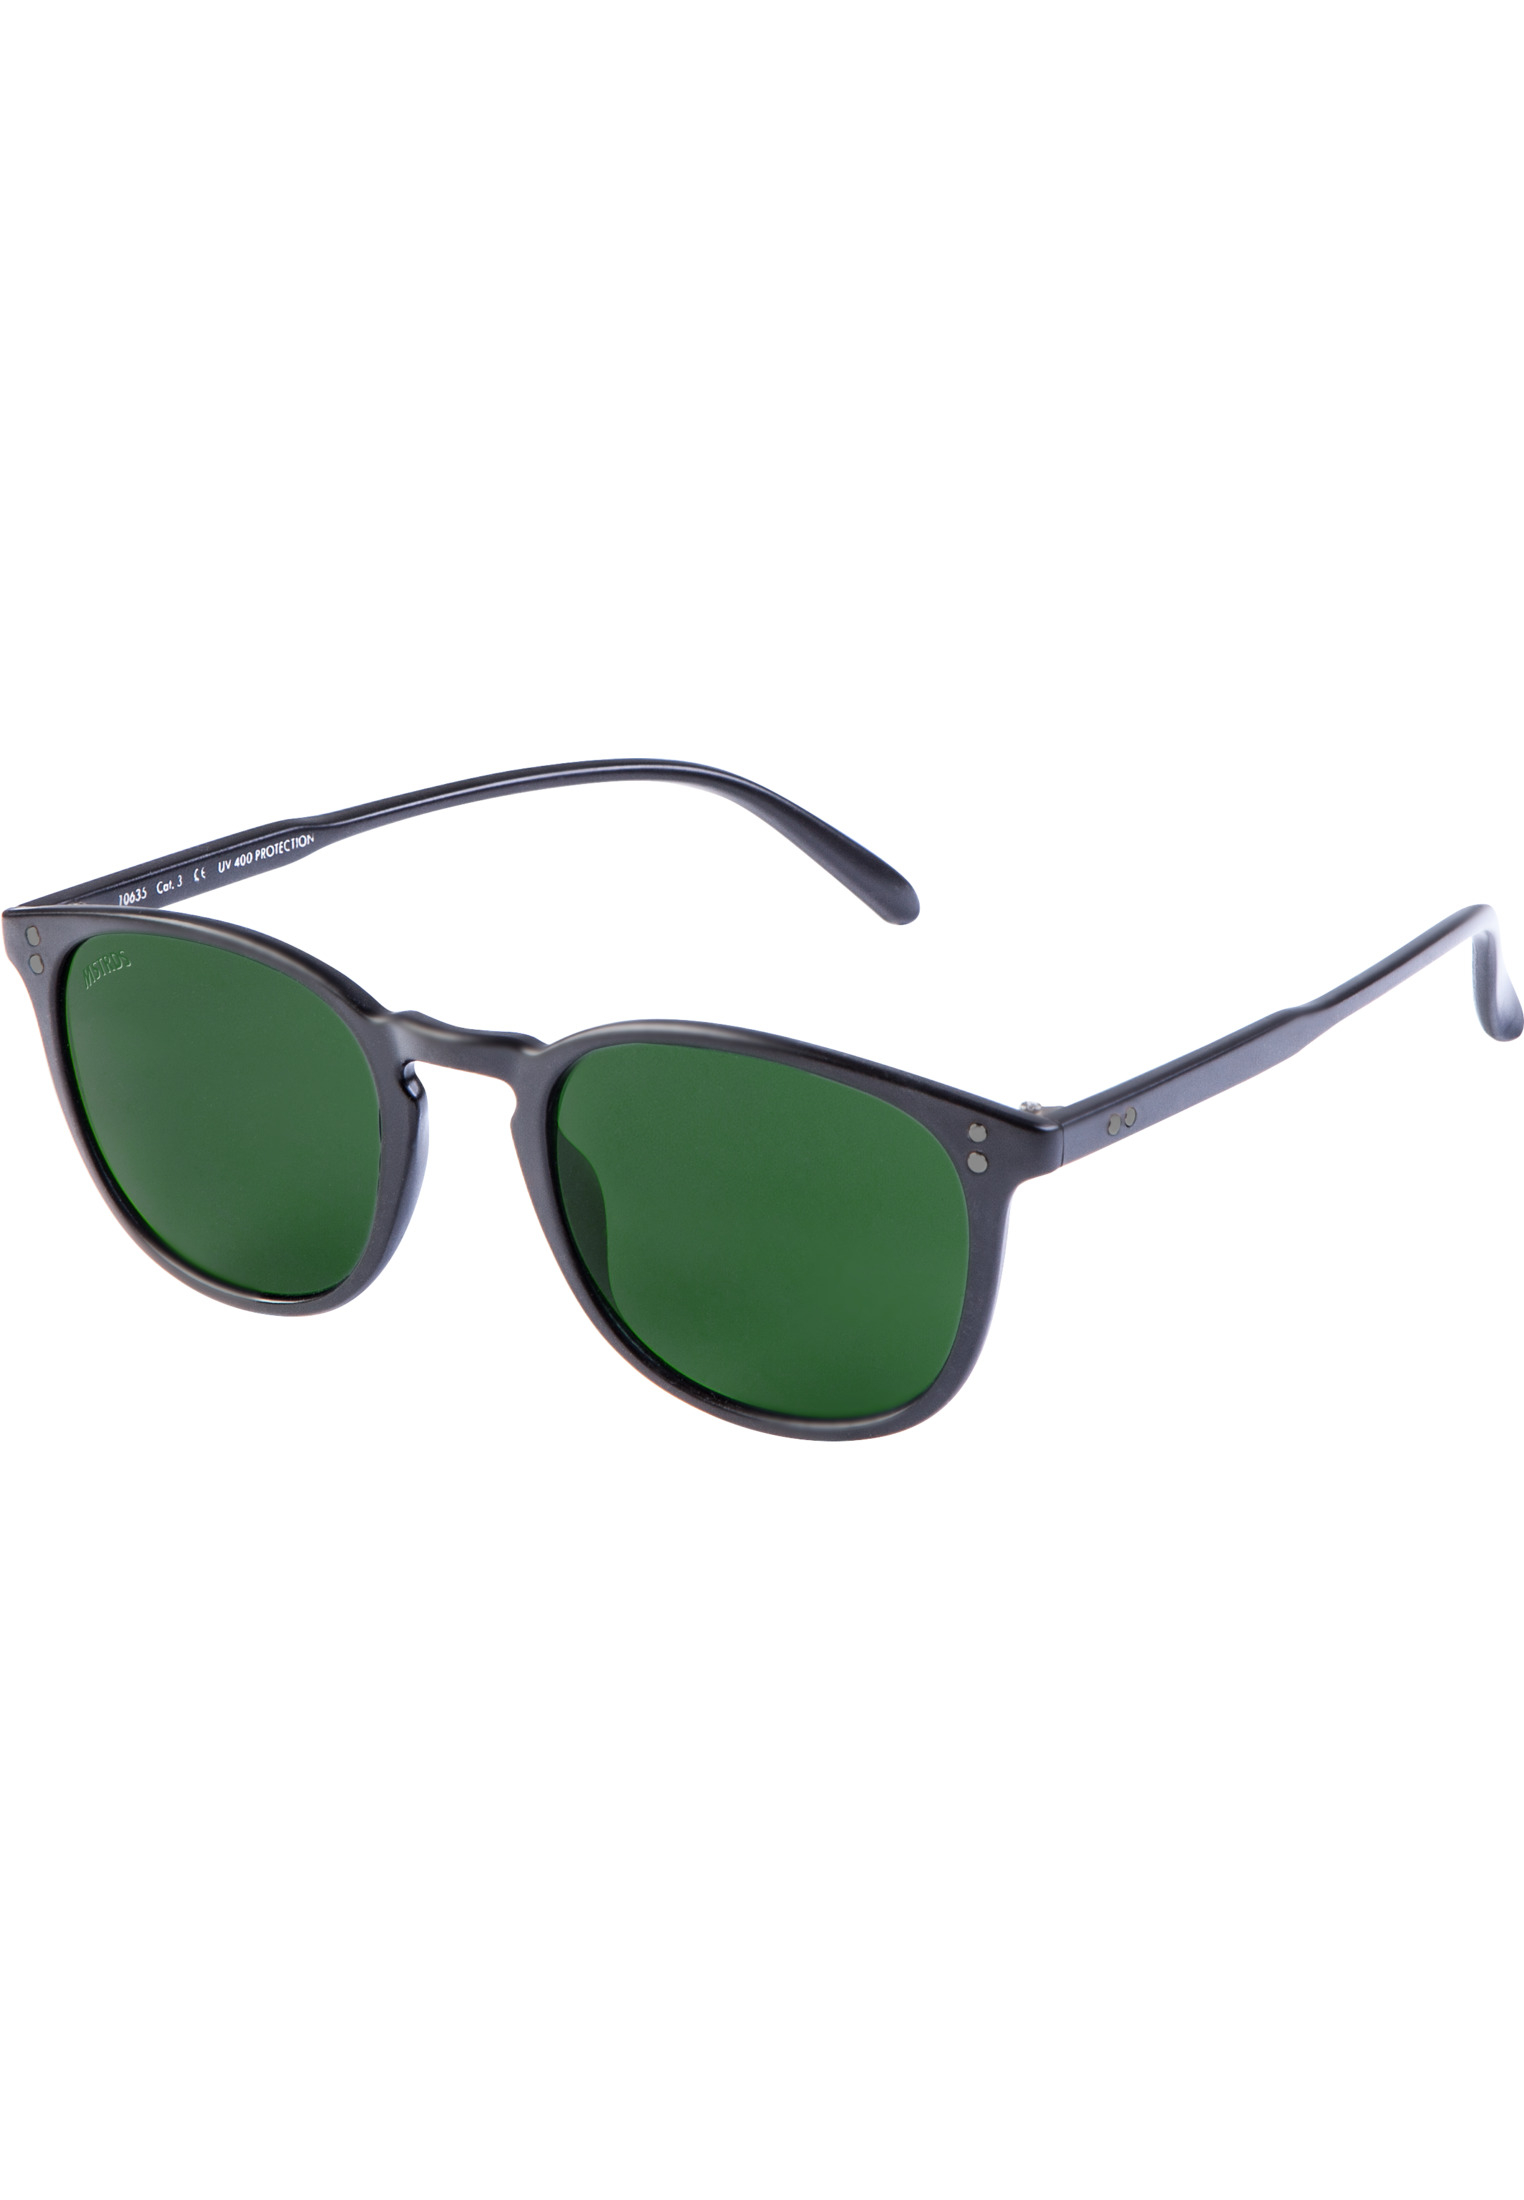 Master Dis Sunglasses Arthur blk/grn - One Size